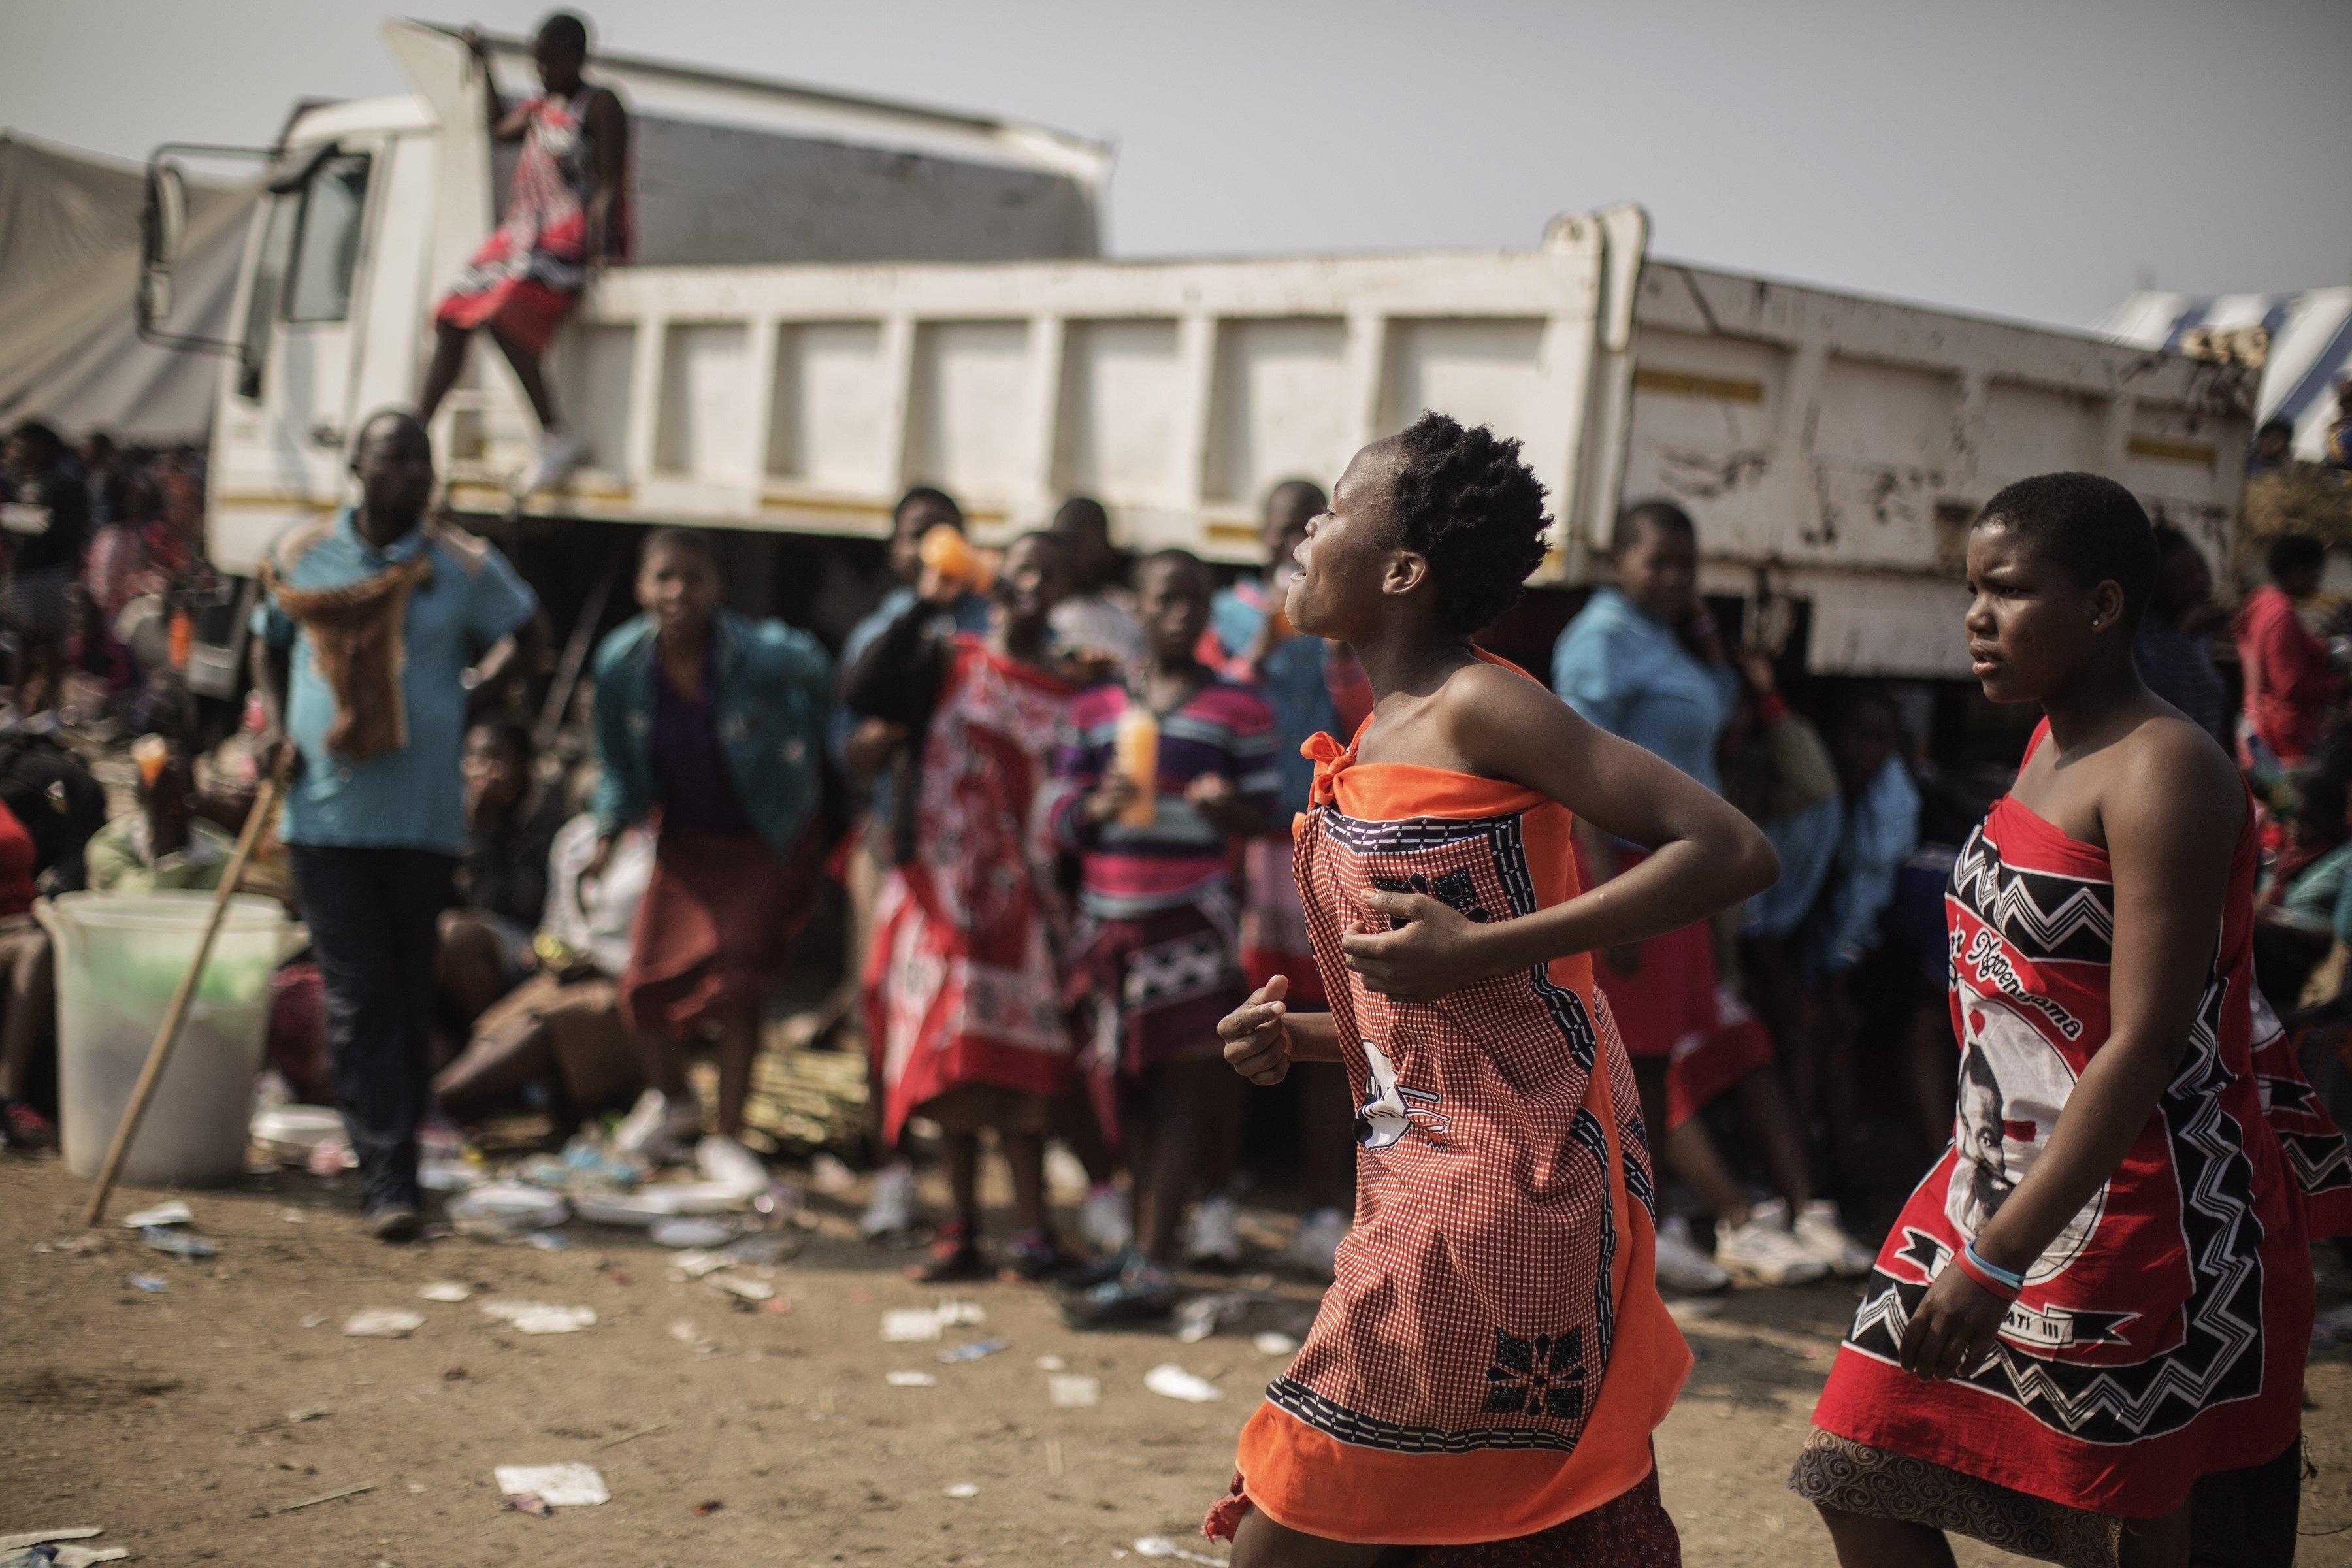 Pity, that Swaziland women reed dance commit error